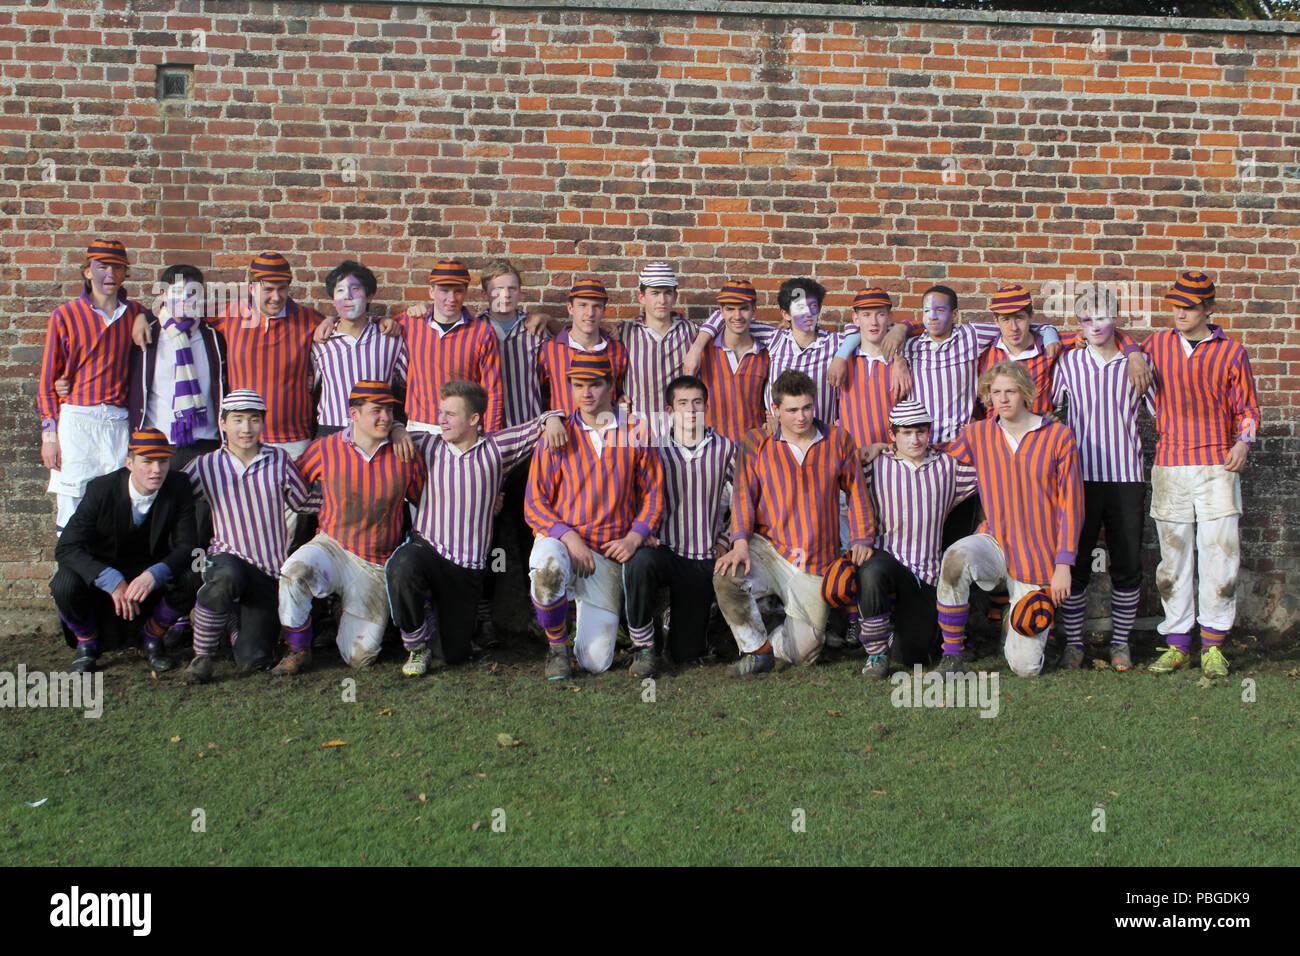 Eton College Wall Game 250th Year - Stock Image